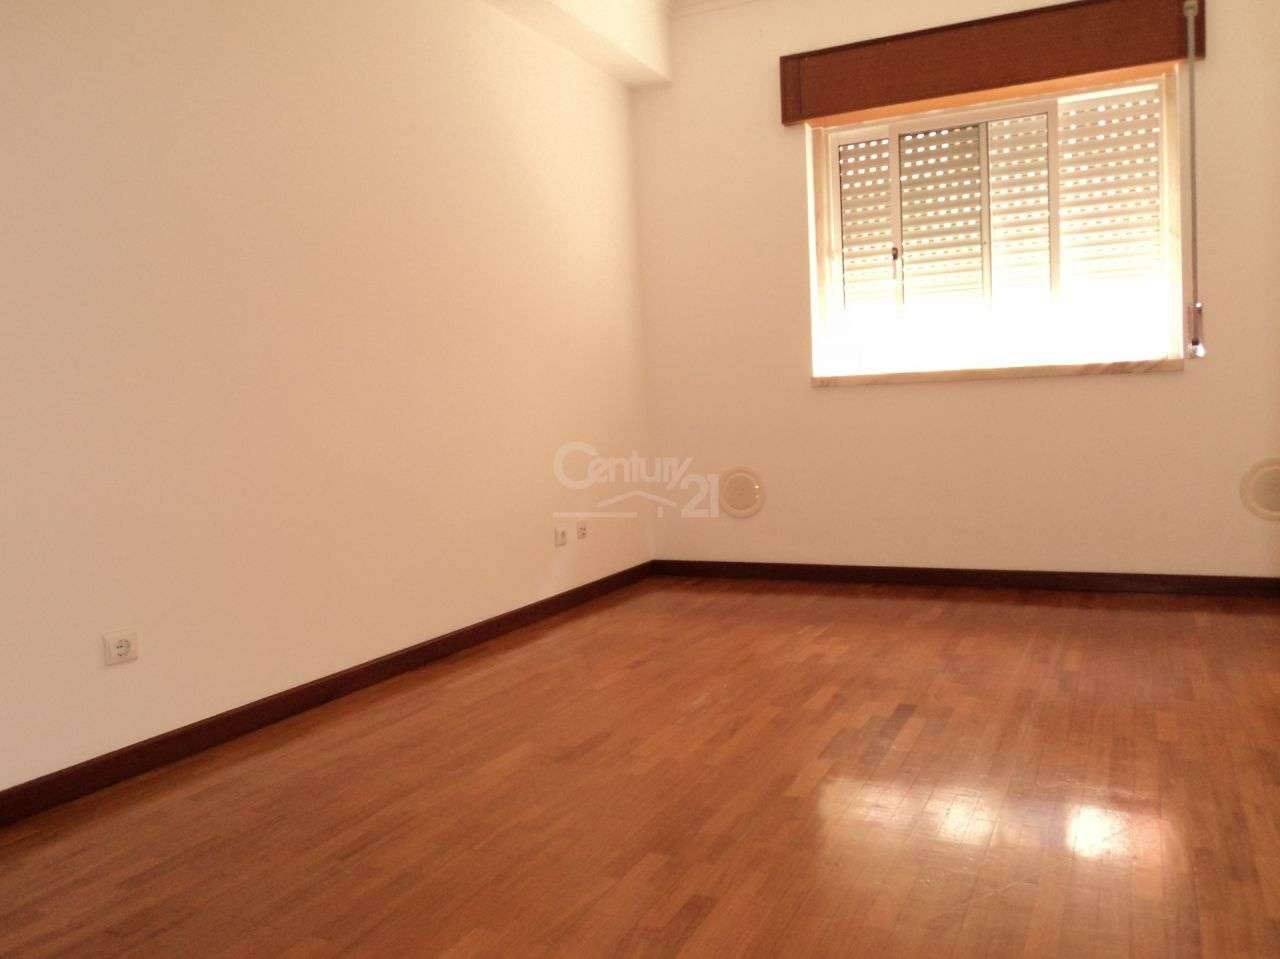 Apartamento para arrendar, Barcarena, Lisboa - Foto 6